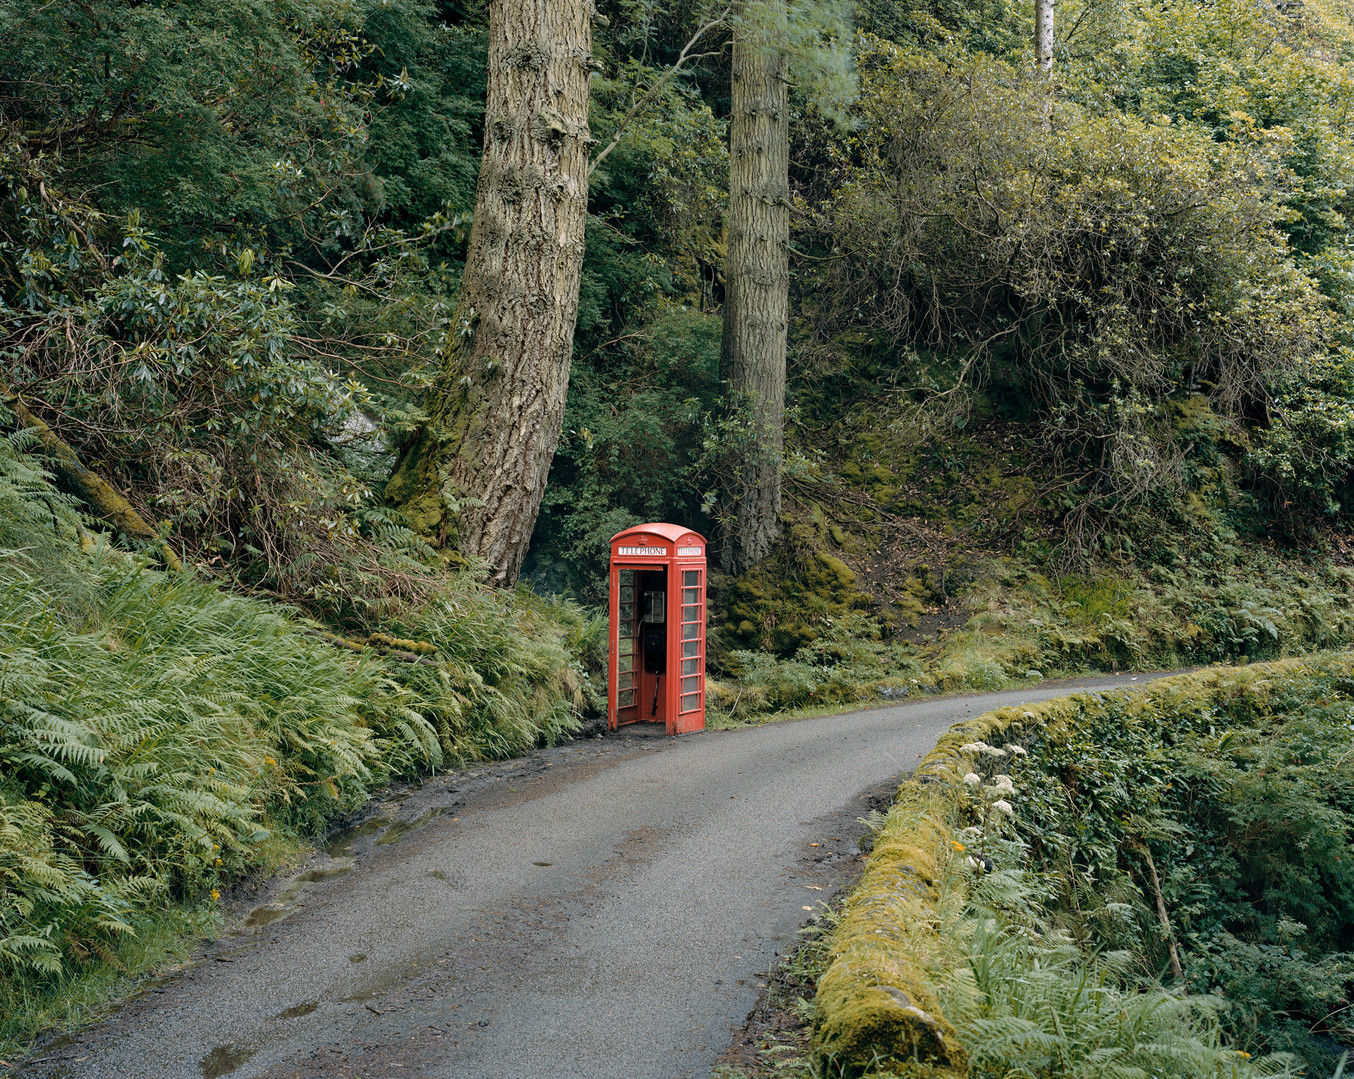 17768.8.17 Carsaig Bay, Isle of Mull, Sc